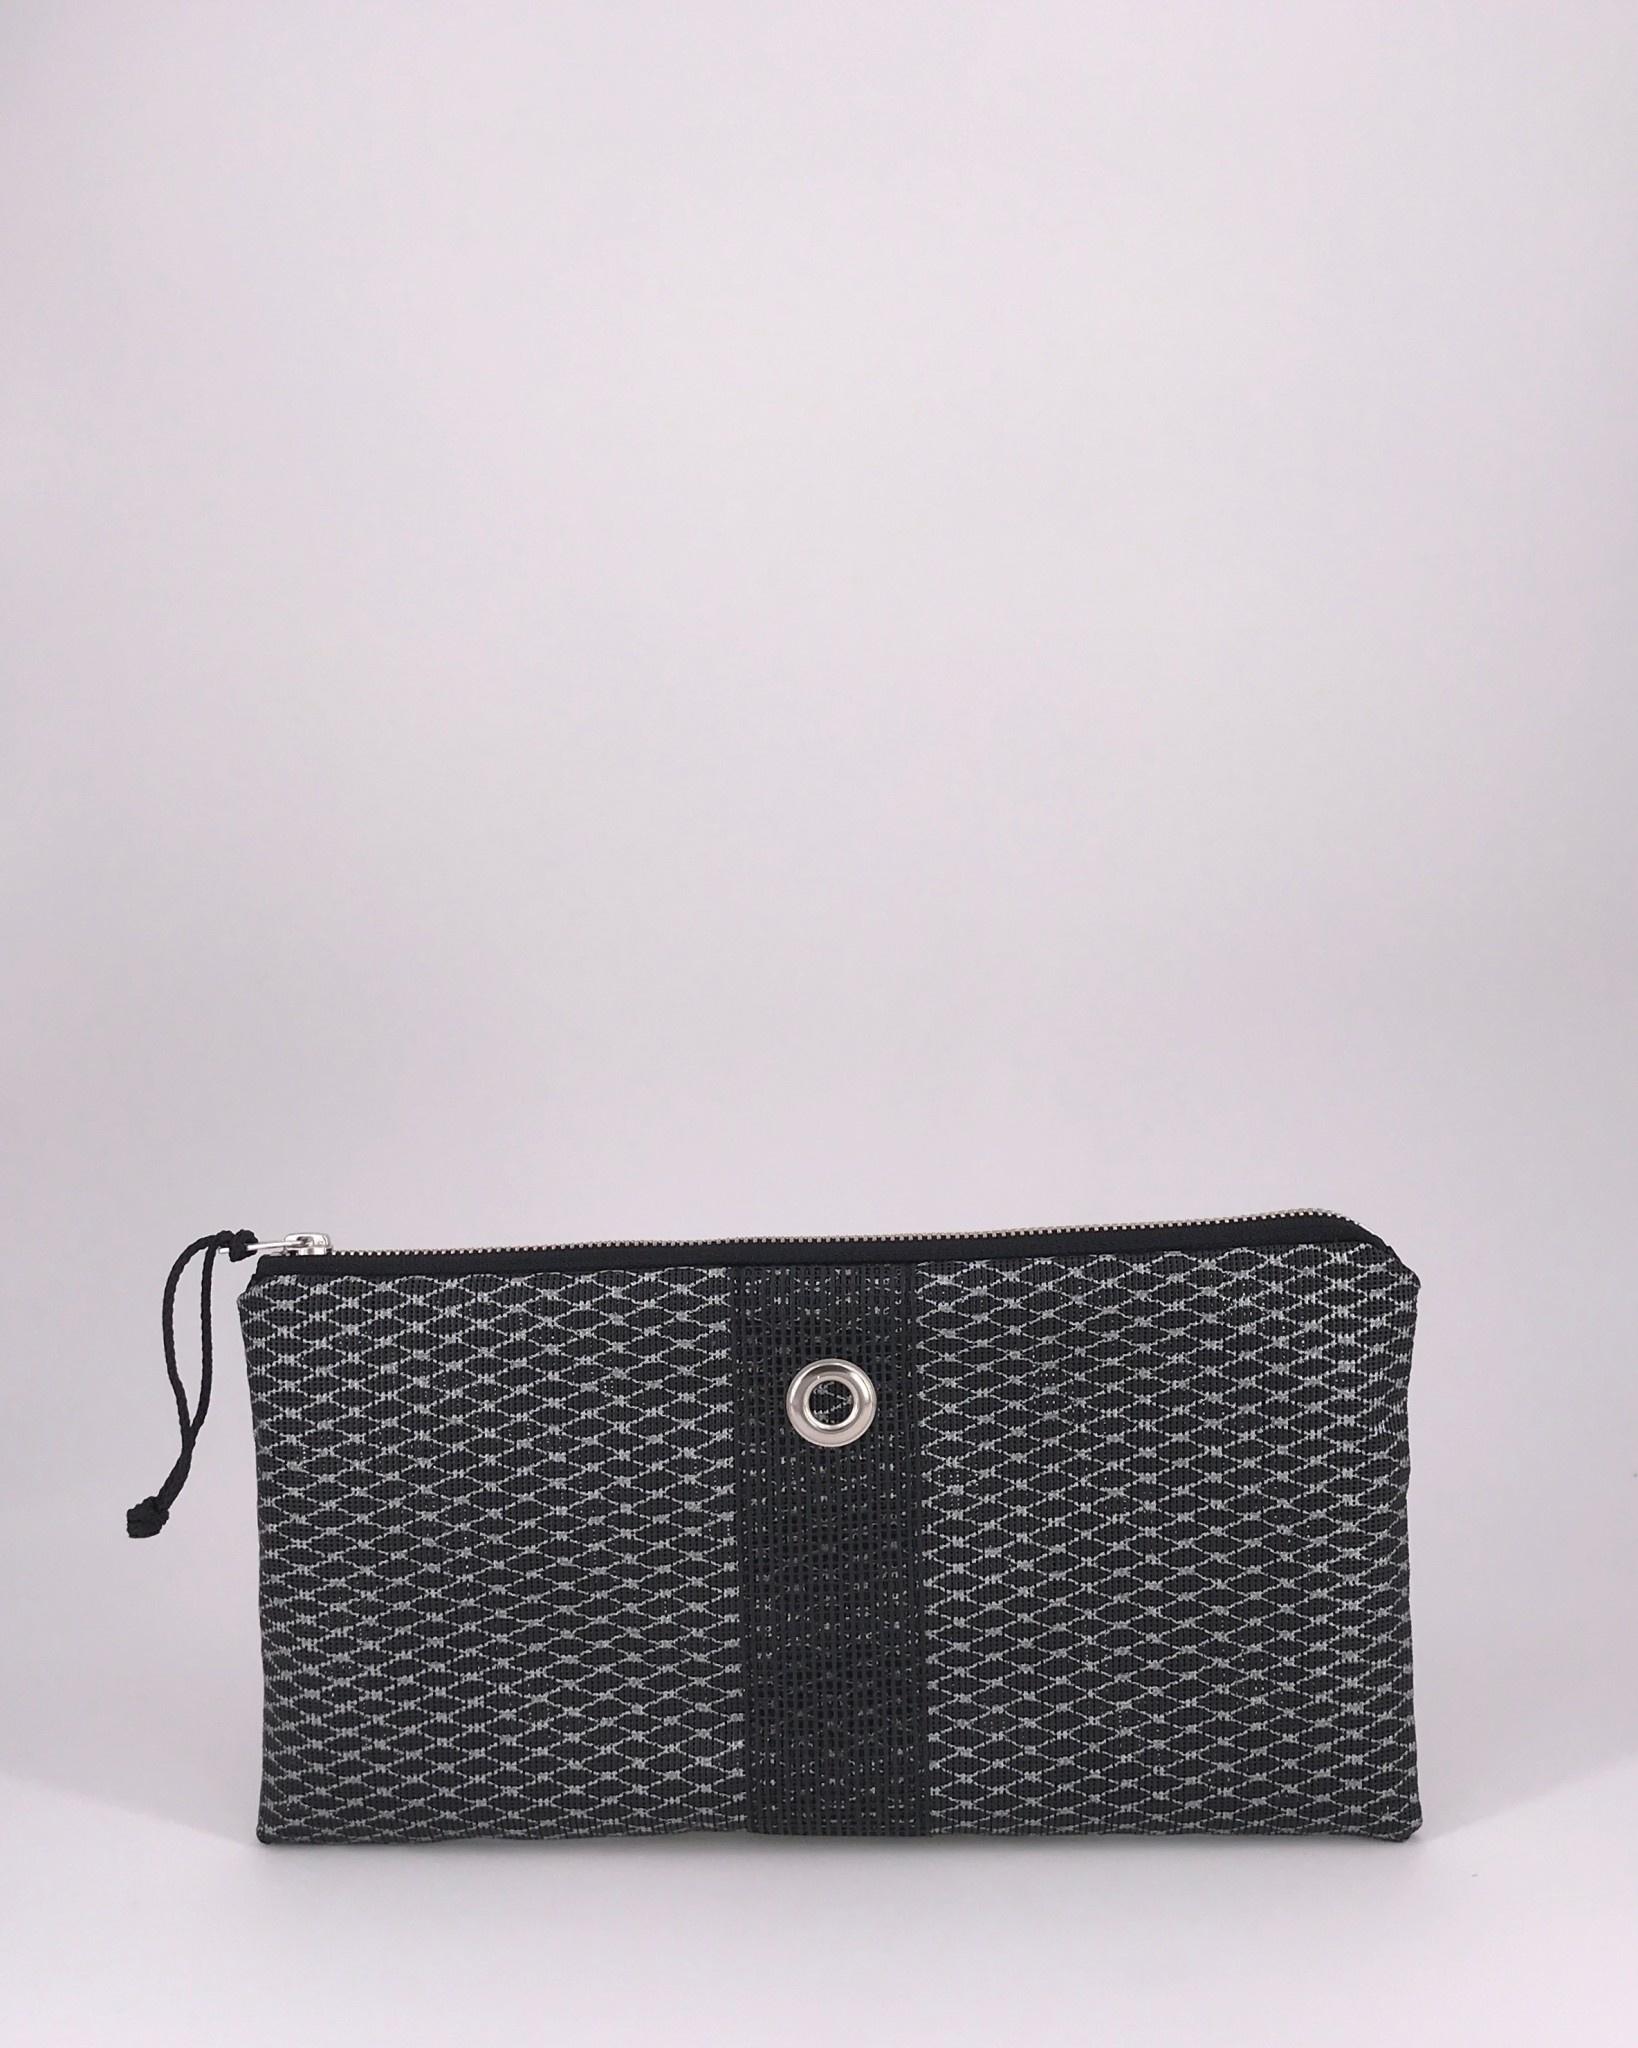 Alaina Marie ® Mini Silver on Black & Black Clutch